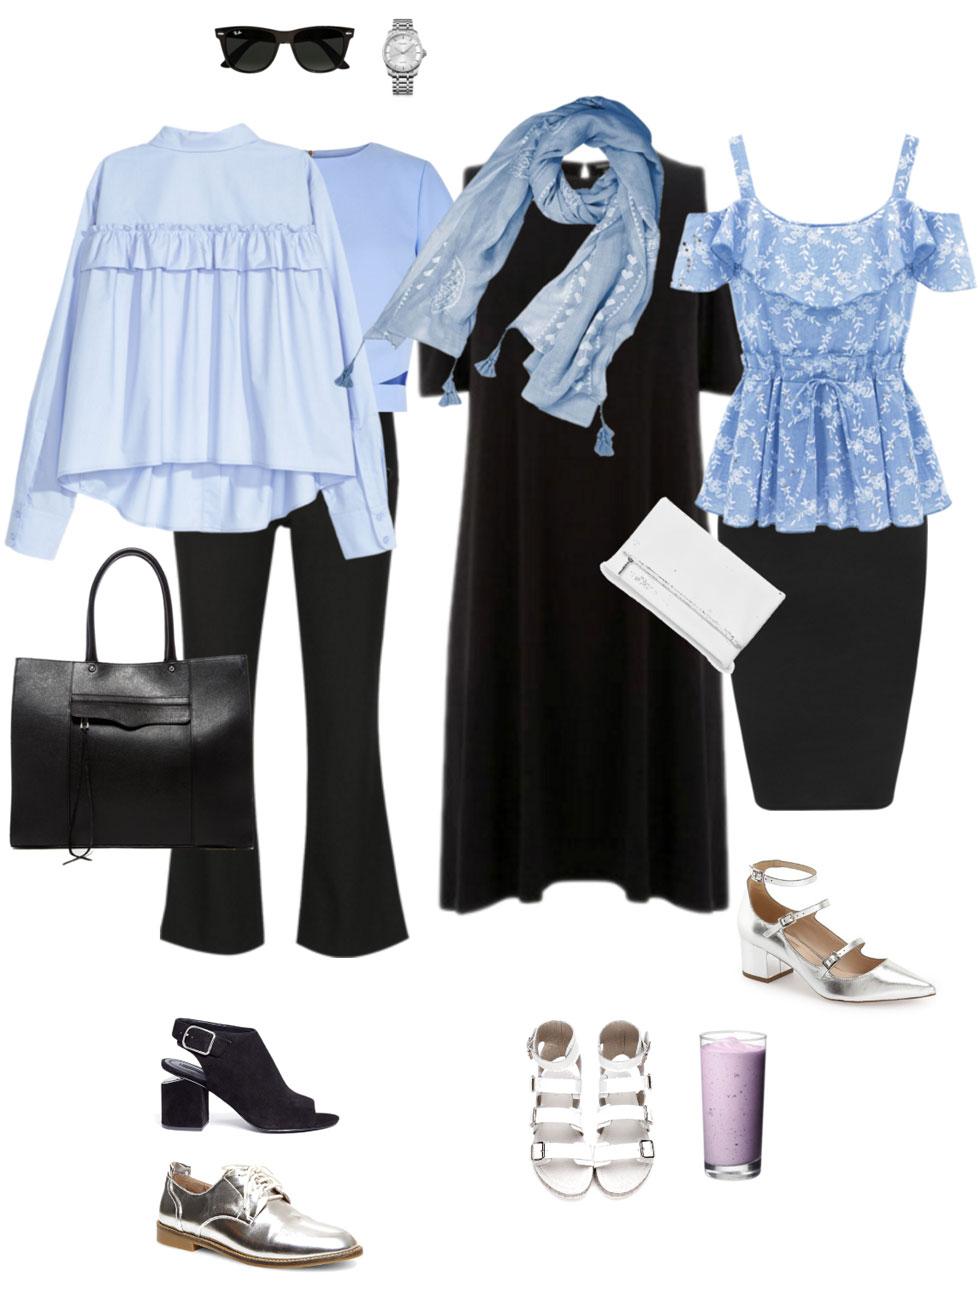 Ensemble: Summer Light Blue & Black